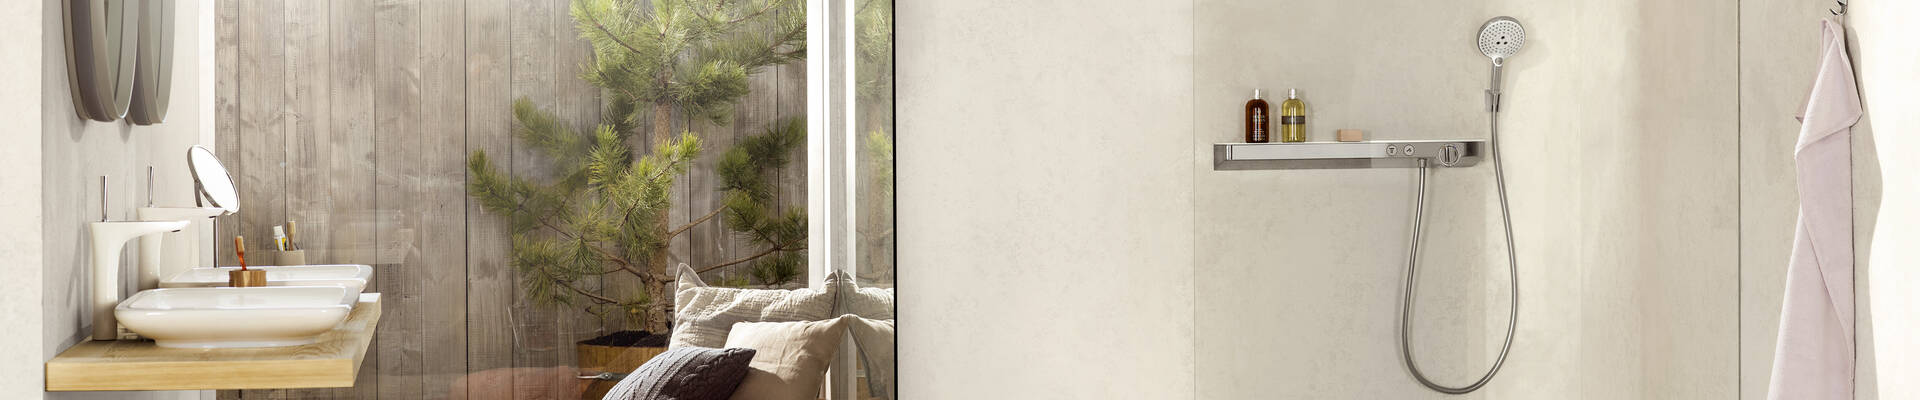 Badezimmer-Trends und kreative Wohntrends | hansgrohe DE